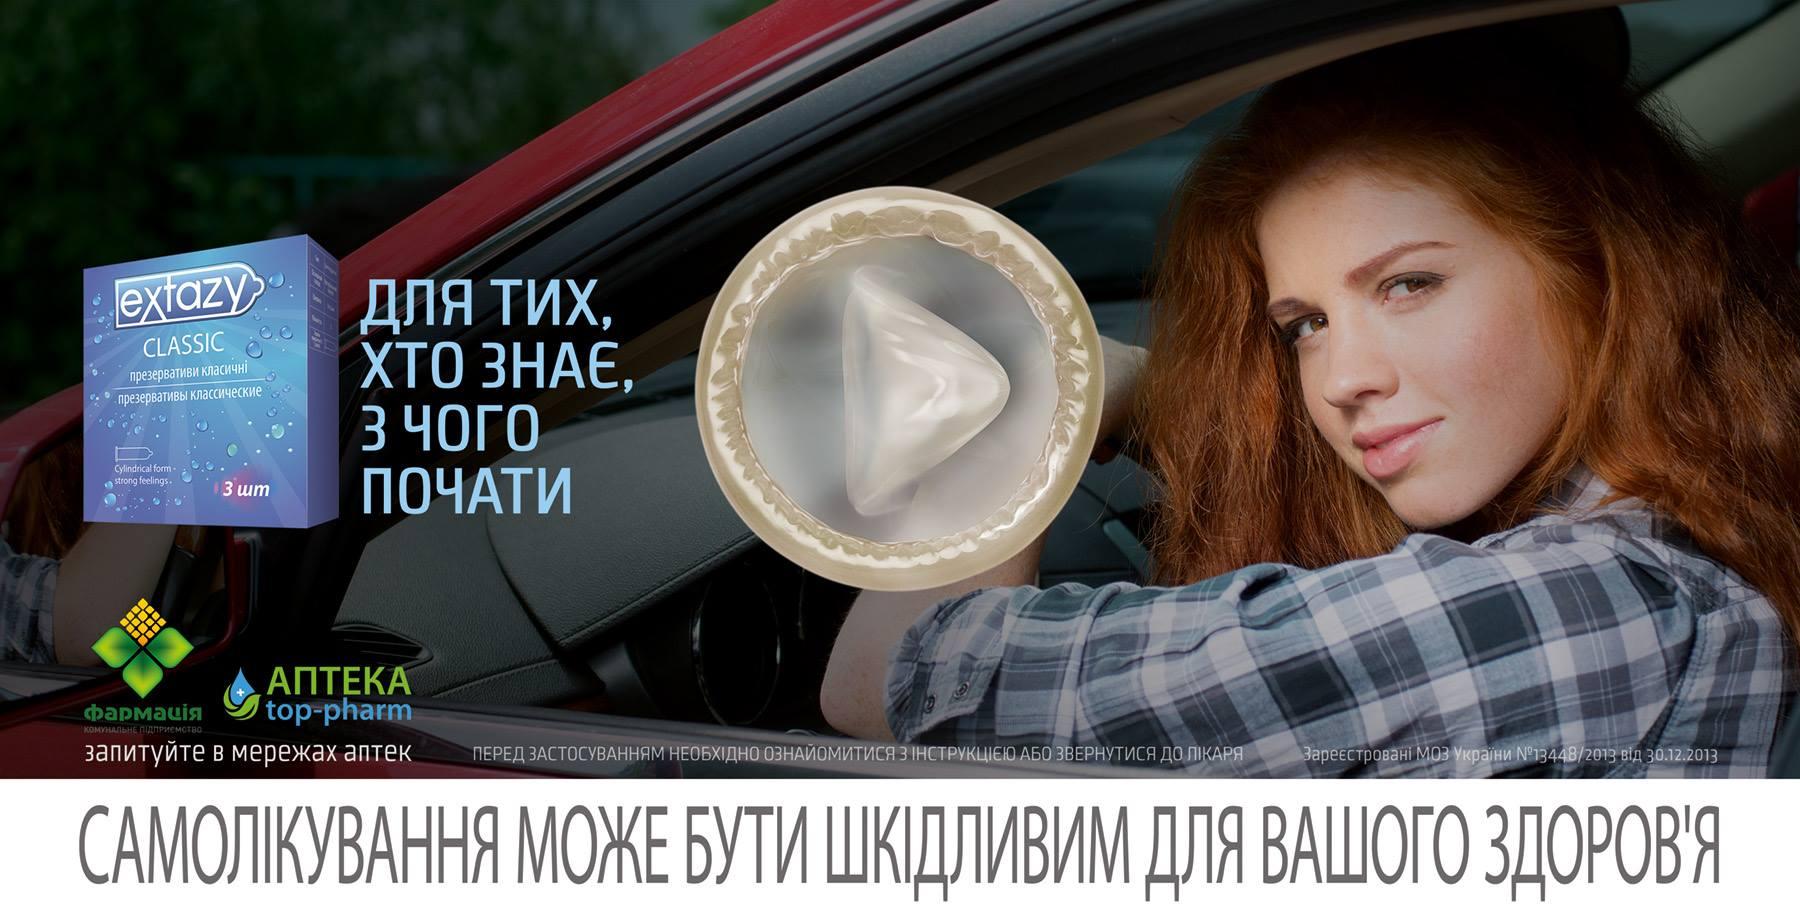 17453554_10155187978688179_1914088875_o.jpg